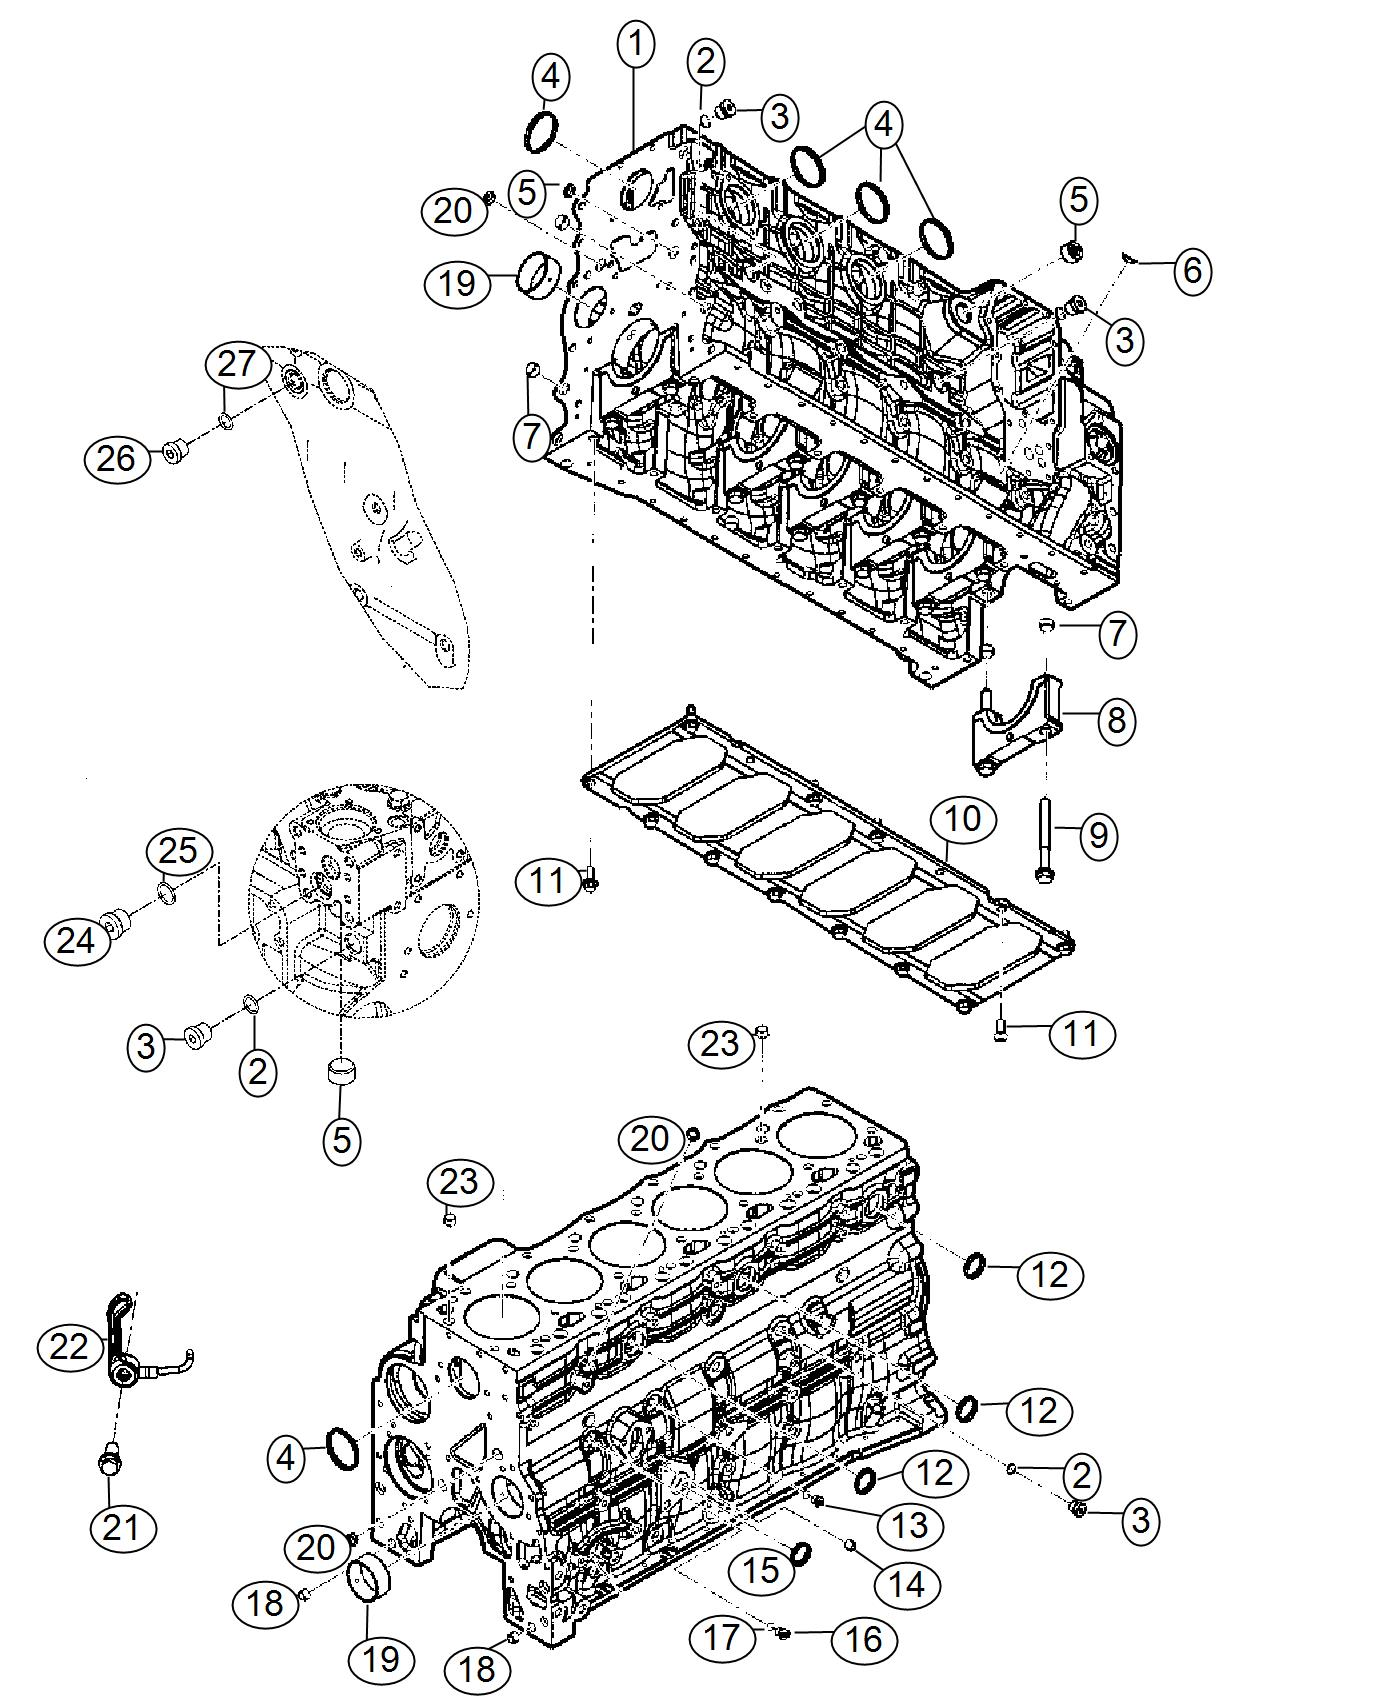 Ram Engine Short Block Remanufactured Emissions